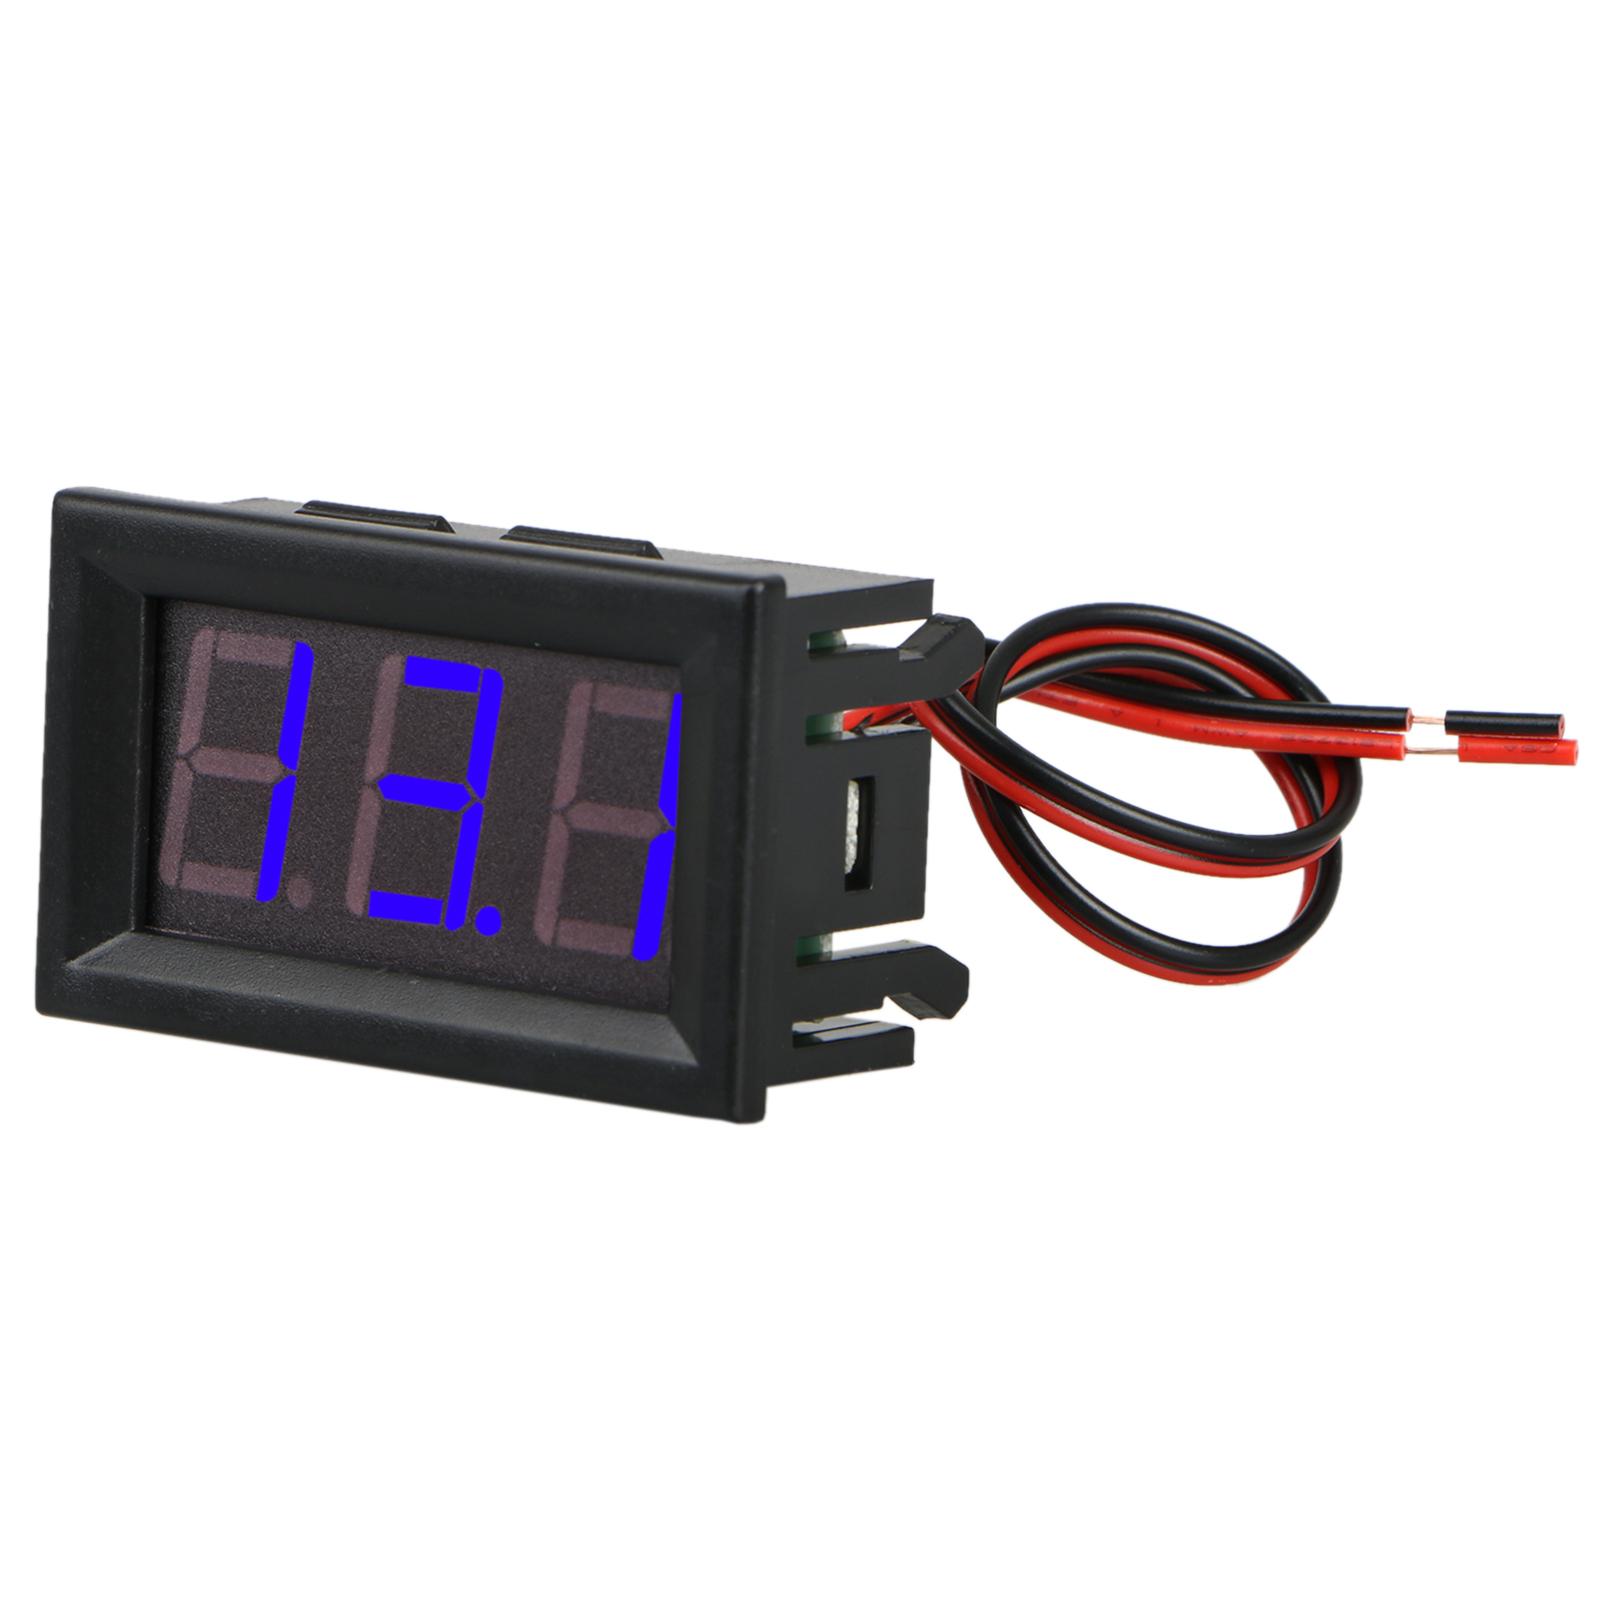 Dc 3 30v 2 Wire Led Digital Display Panel Volt Meter Voltage 2wire Wiring A Potentiometer